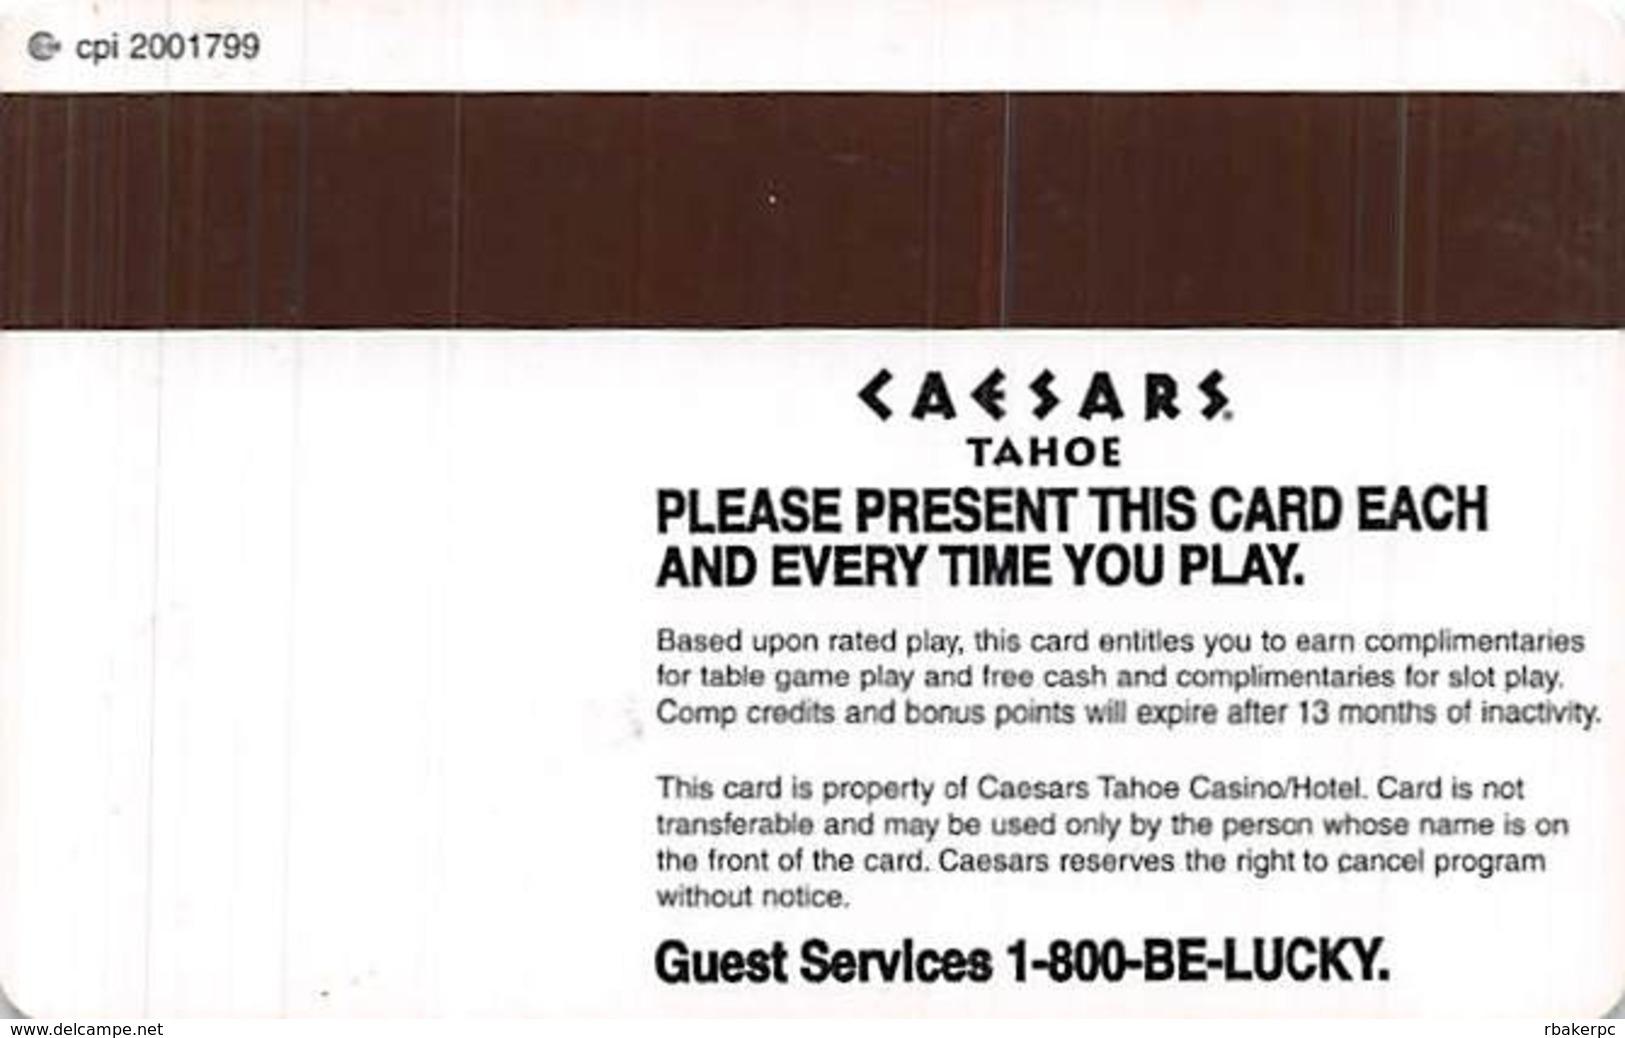 Caesars Casino Lake Tahoe, NV BLANK Slot Card - 5 Line Pattern - Cpi 2001799 Over Mag Stripe - Casino Cards